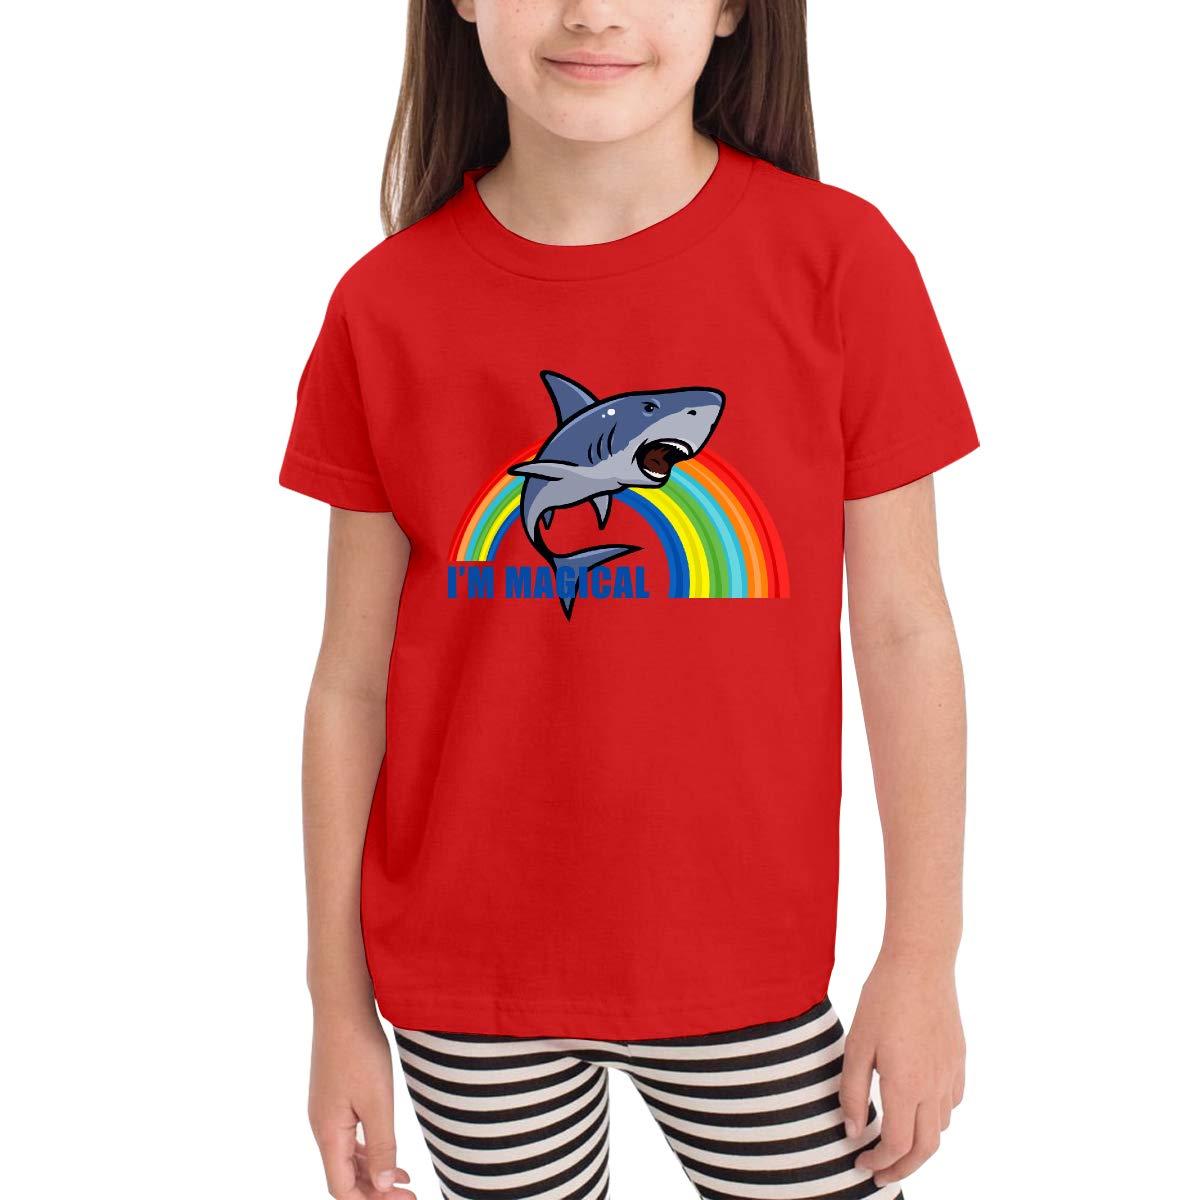 Magical Shark Toddler Kids Girls Boys Adorable T-Shirt Cotton Short Sleeve Graphic Tee 2-6 Years